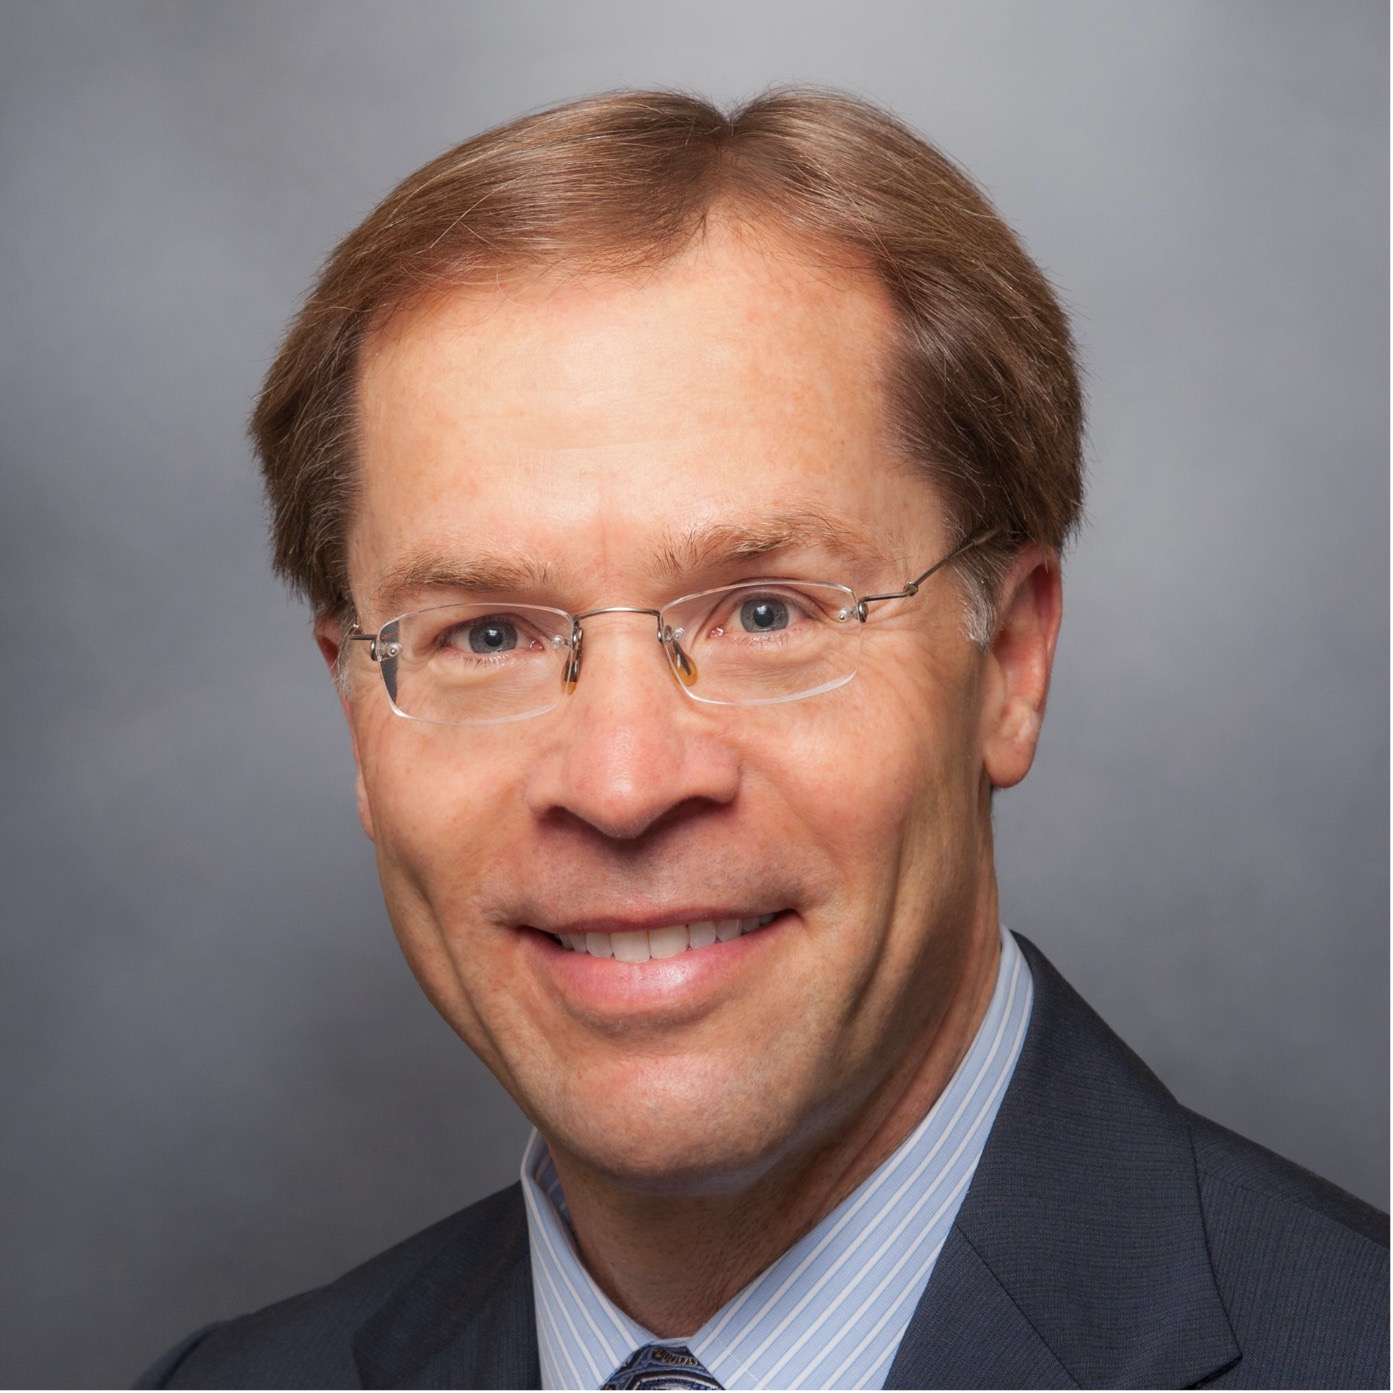 Chris Stenzel, M.B.A. Headshot